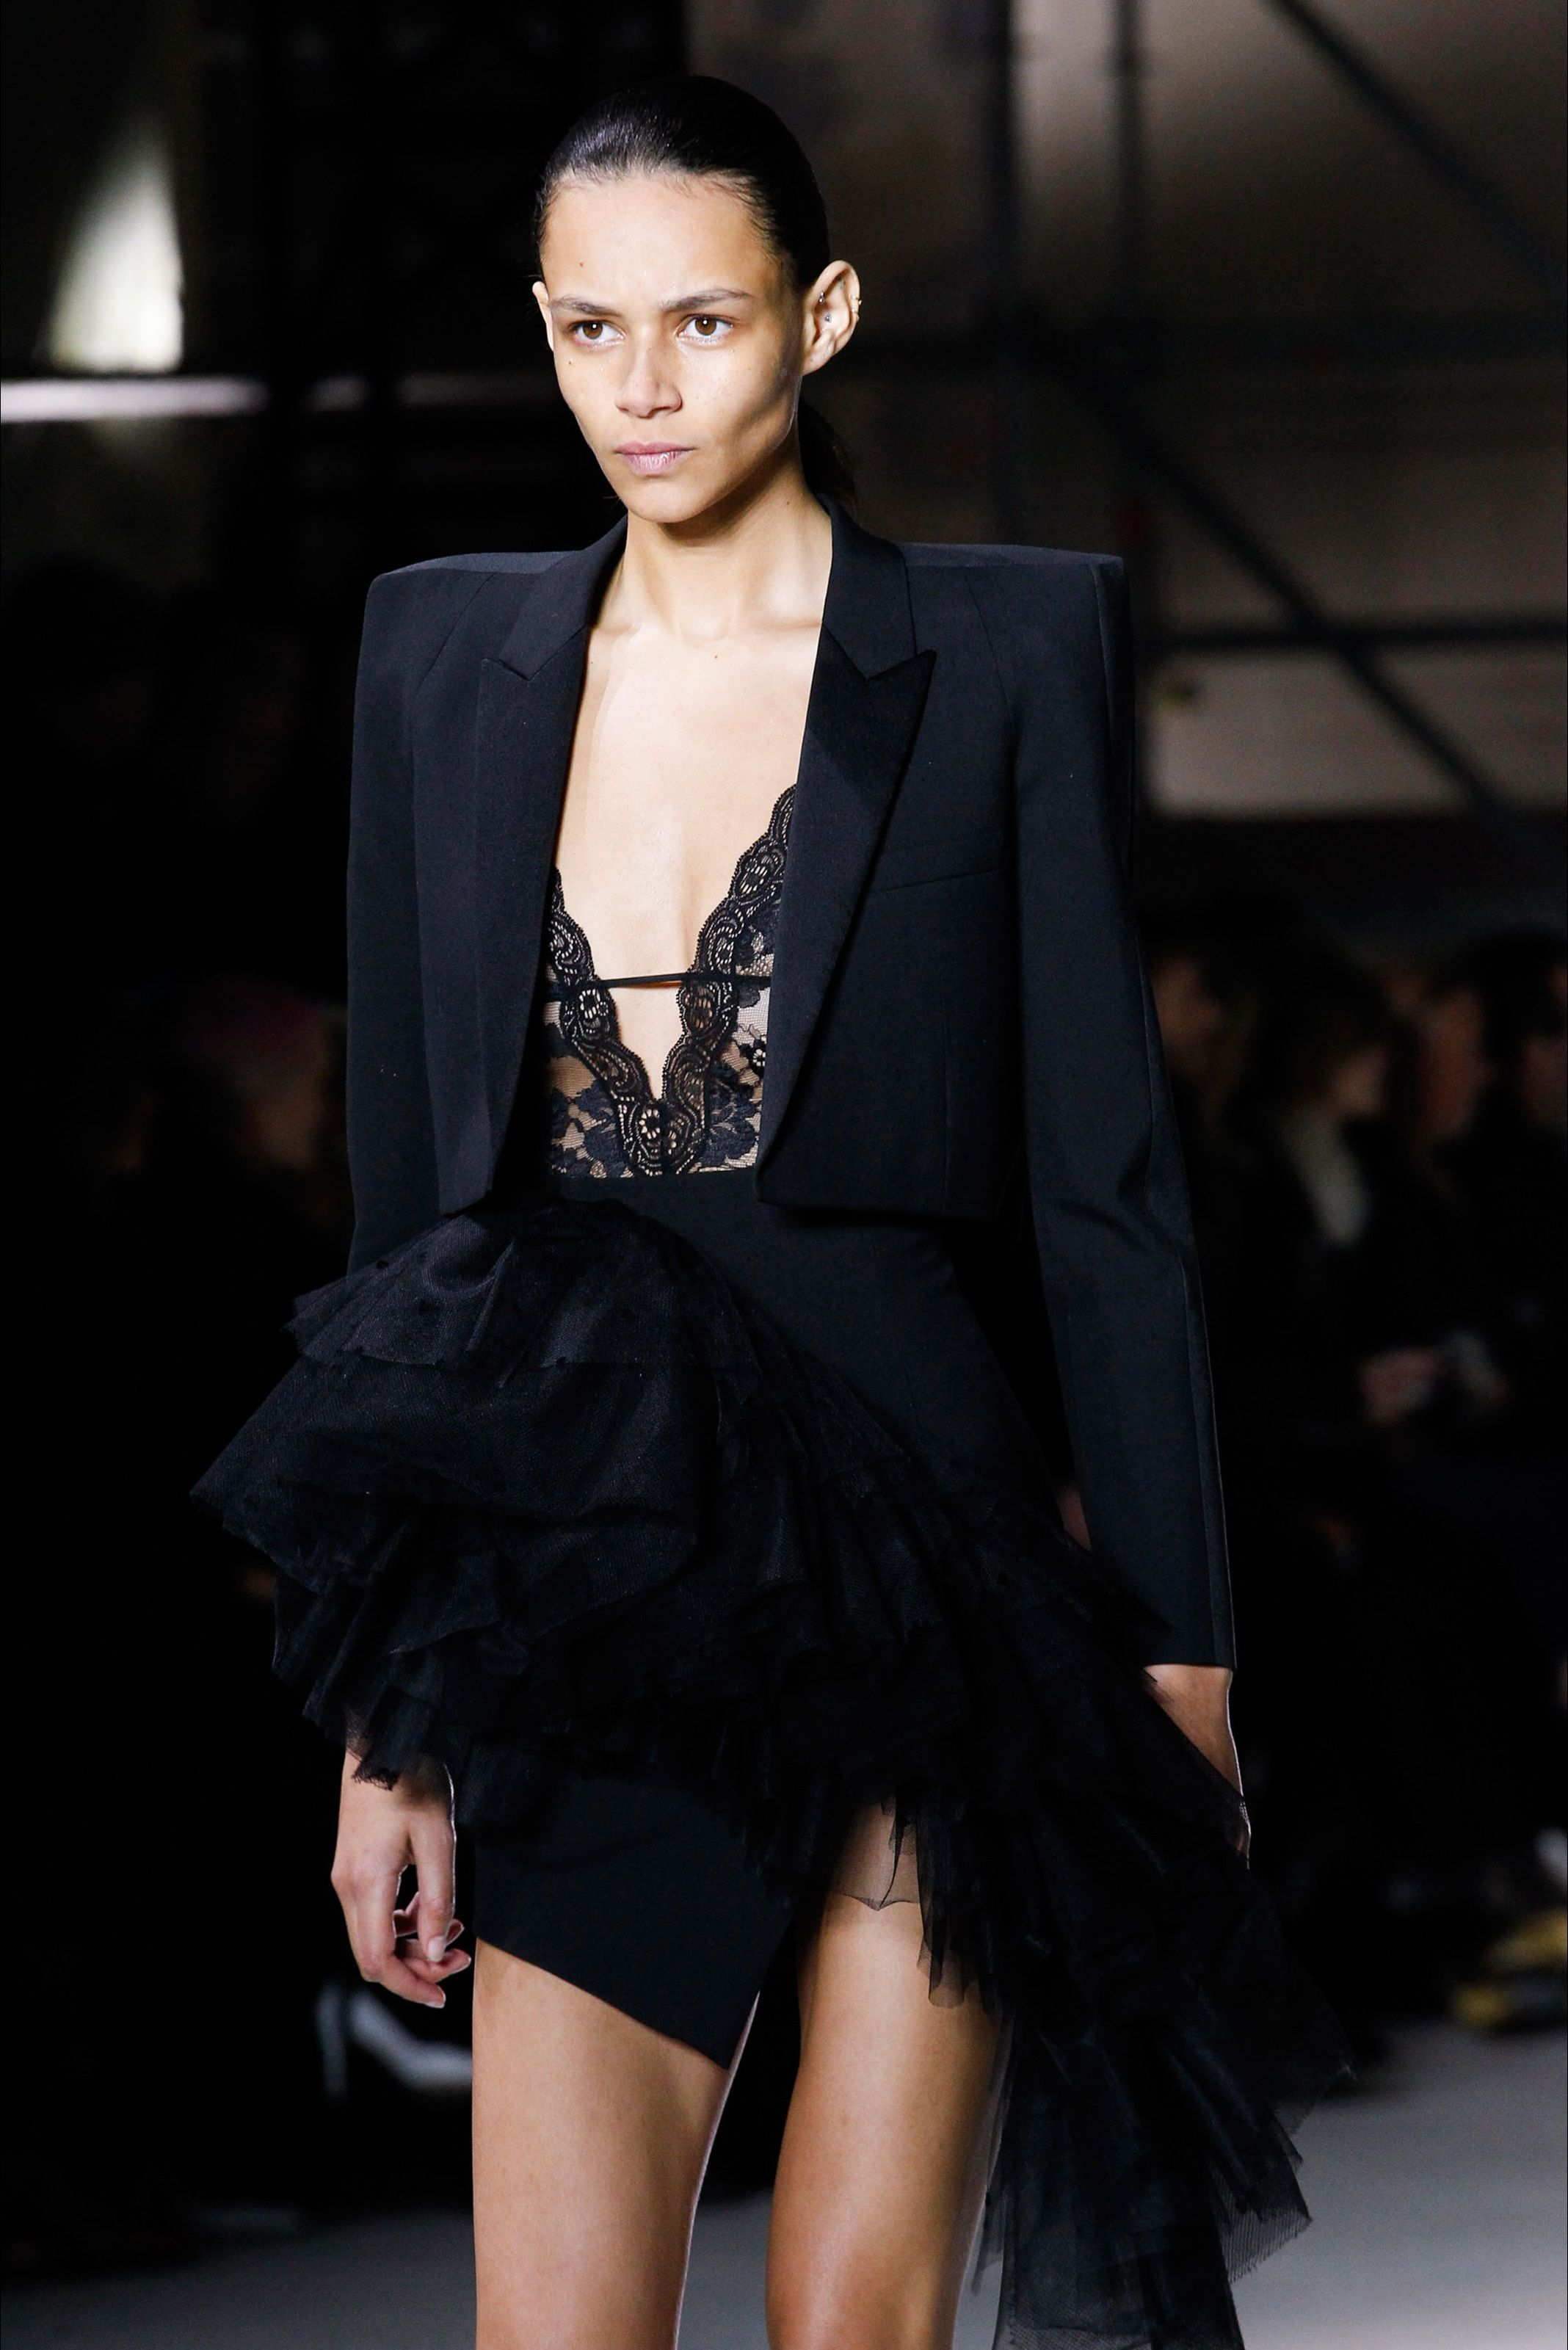 Sfilata Saint Laurent Parigi - Collezioni Autunno Inverno 2017-18 -  Dettagli - Vogue 153a0300b00